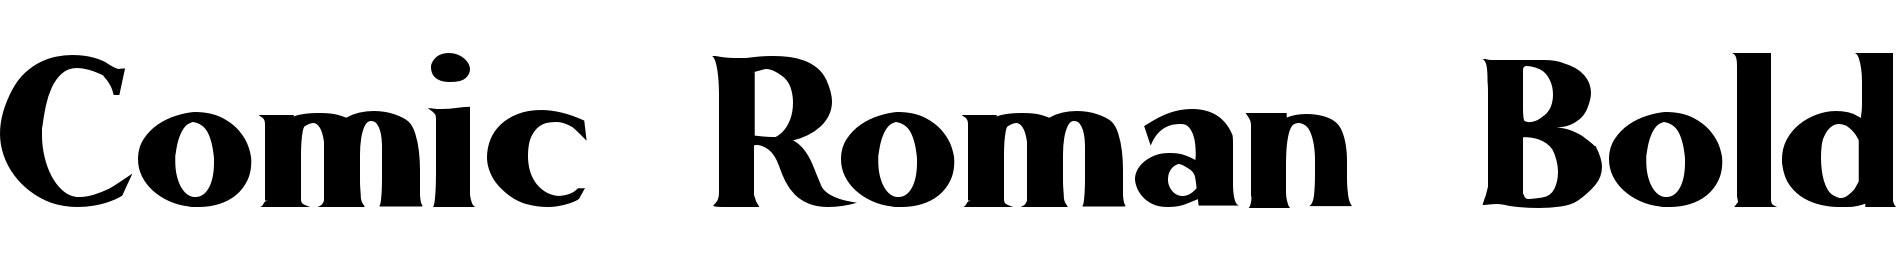 Comic Roman Bold